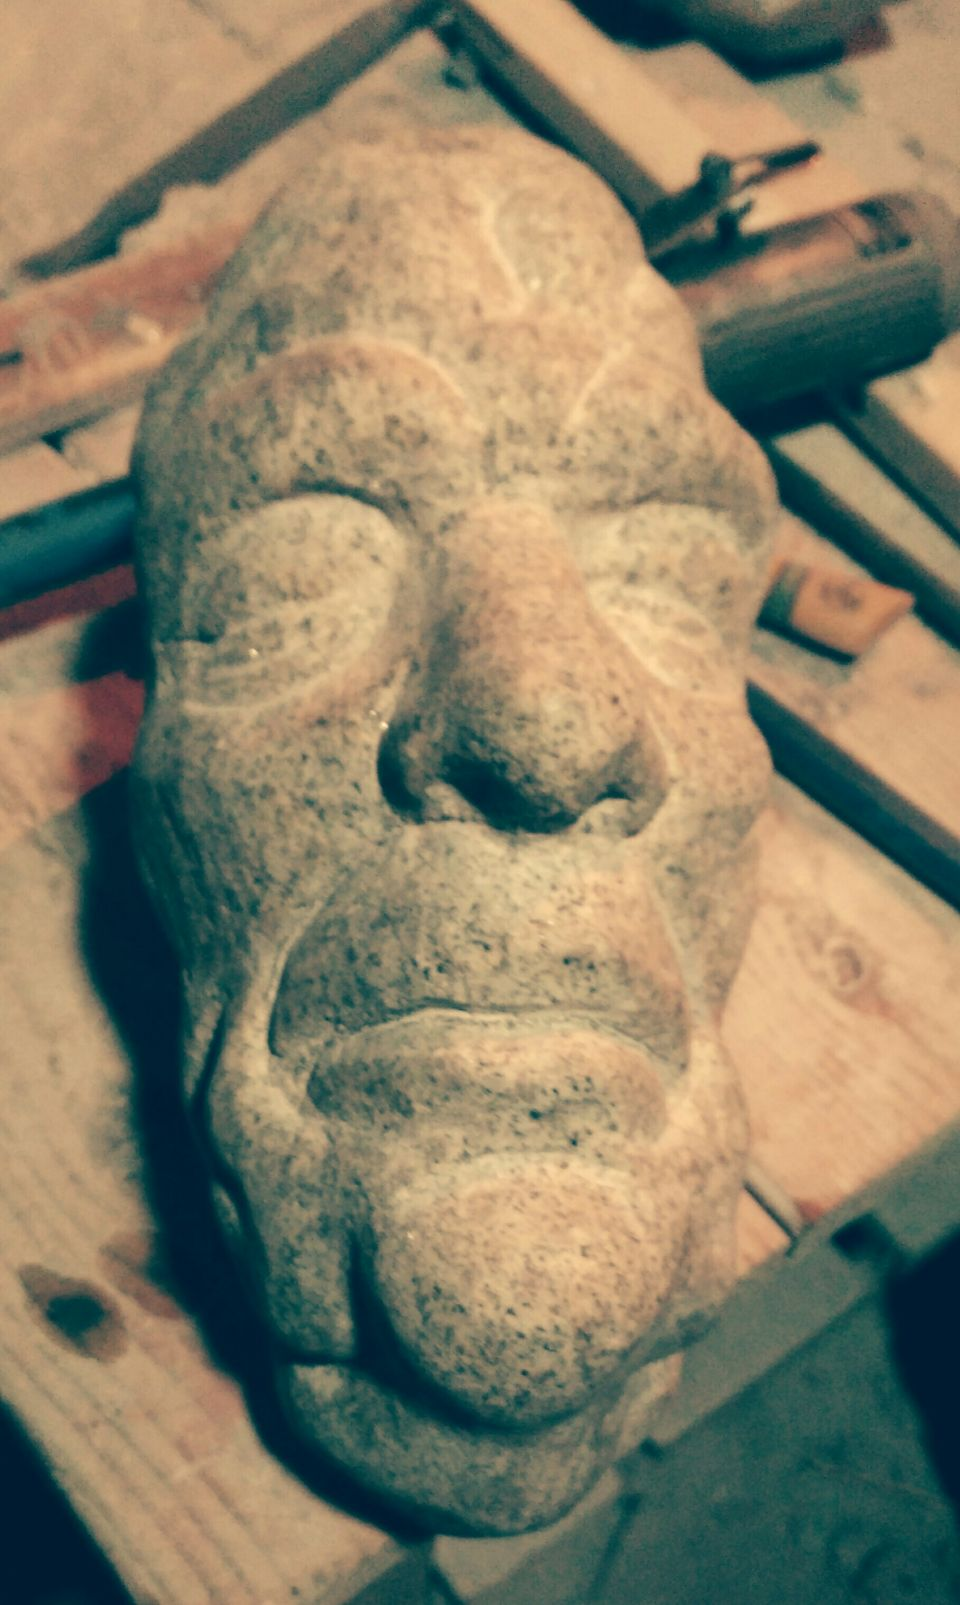 9dc8de52ee8128ec063d4bd8 Welcome to Sculpture Art Space - Rock&Tools | Sculpture Stone Tools